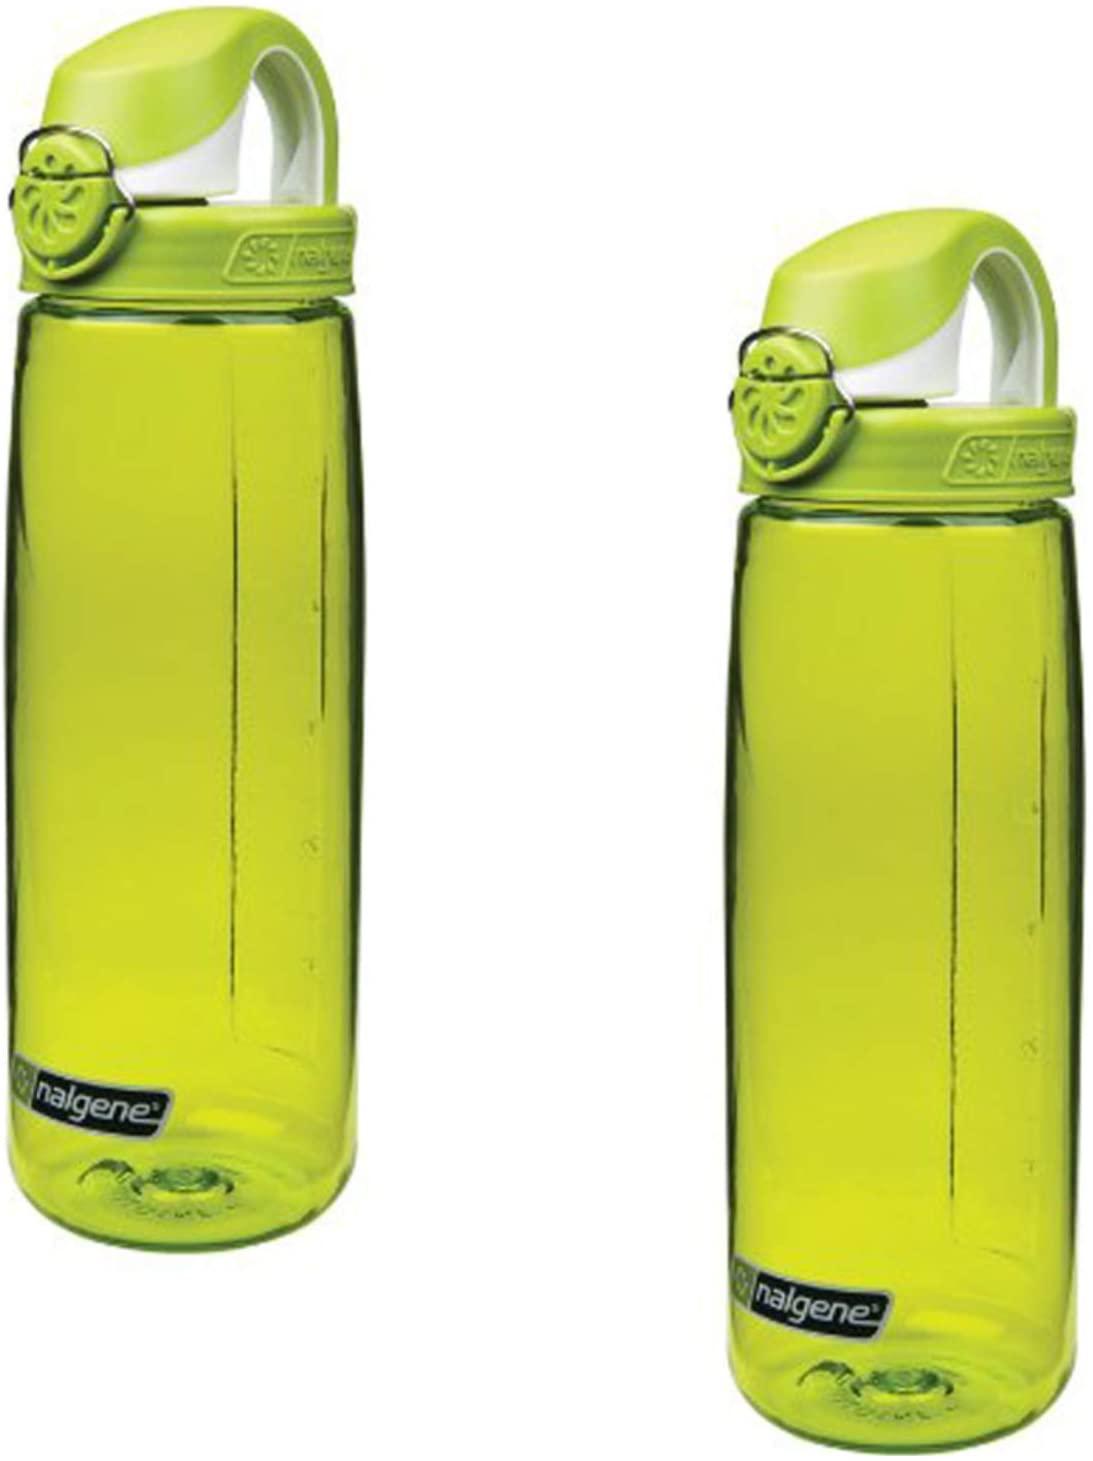 Nalgene On The Fly 24 oz Water Bottle Green w/Green and White Cap - 2 Pack